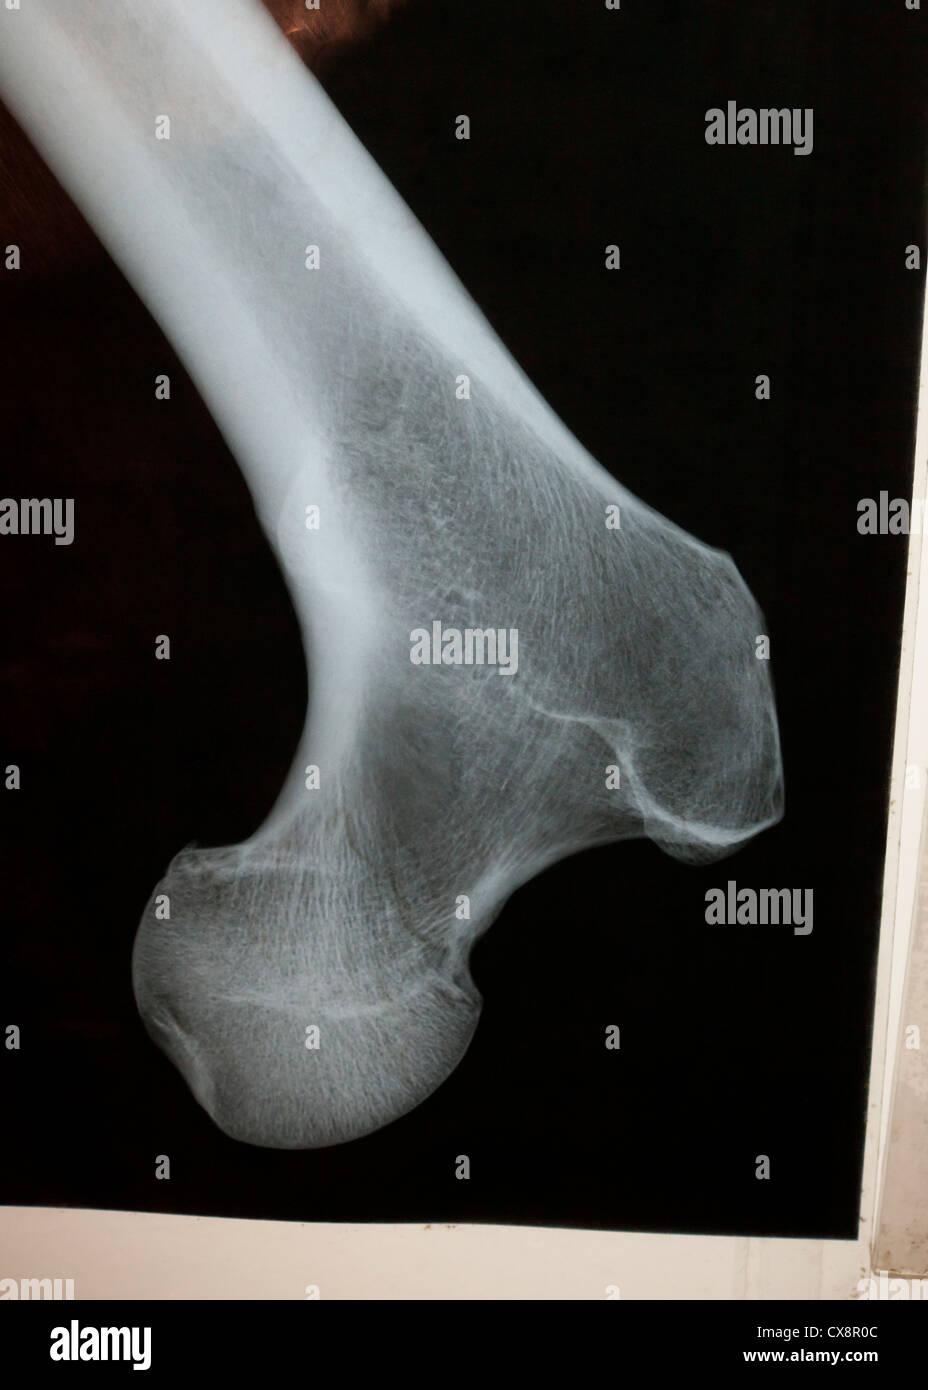 X-ray of femur bone - Stock Image